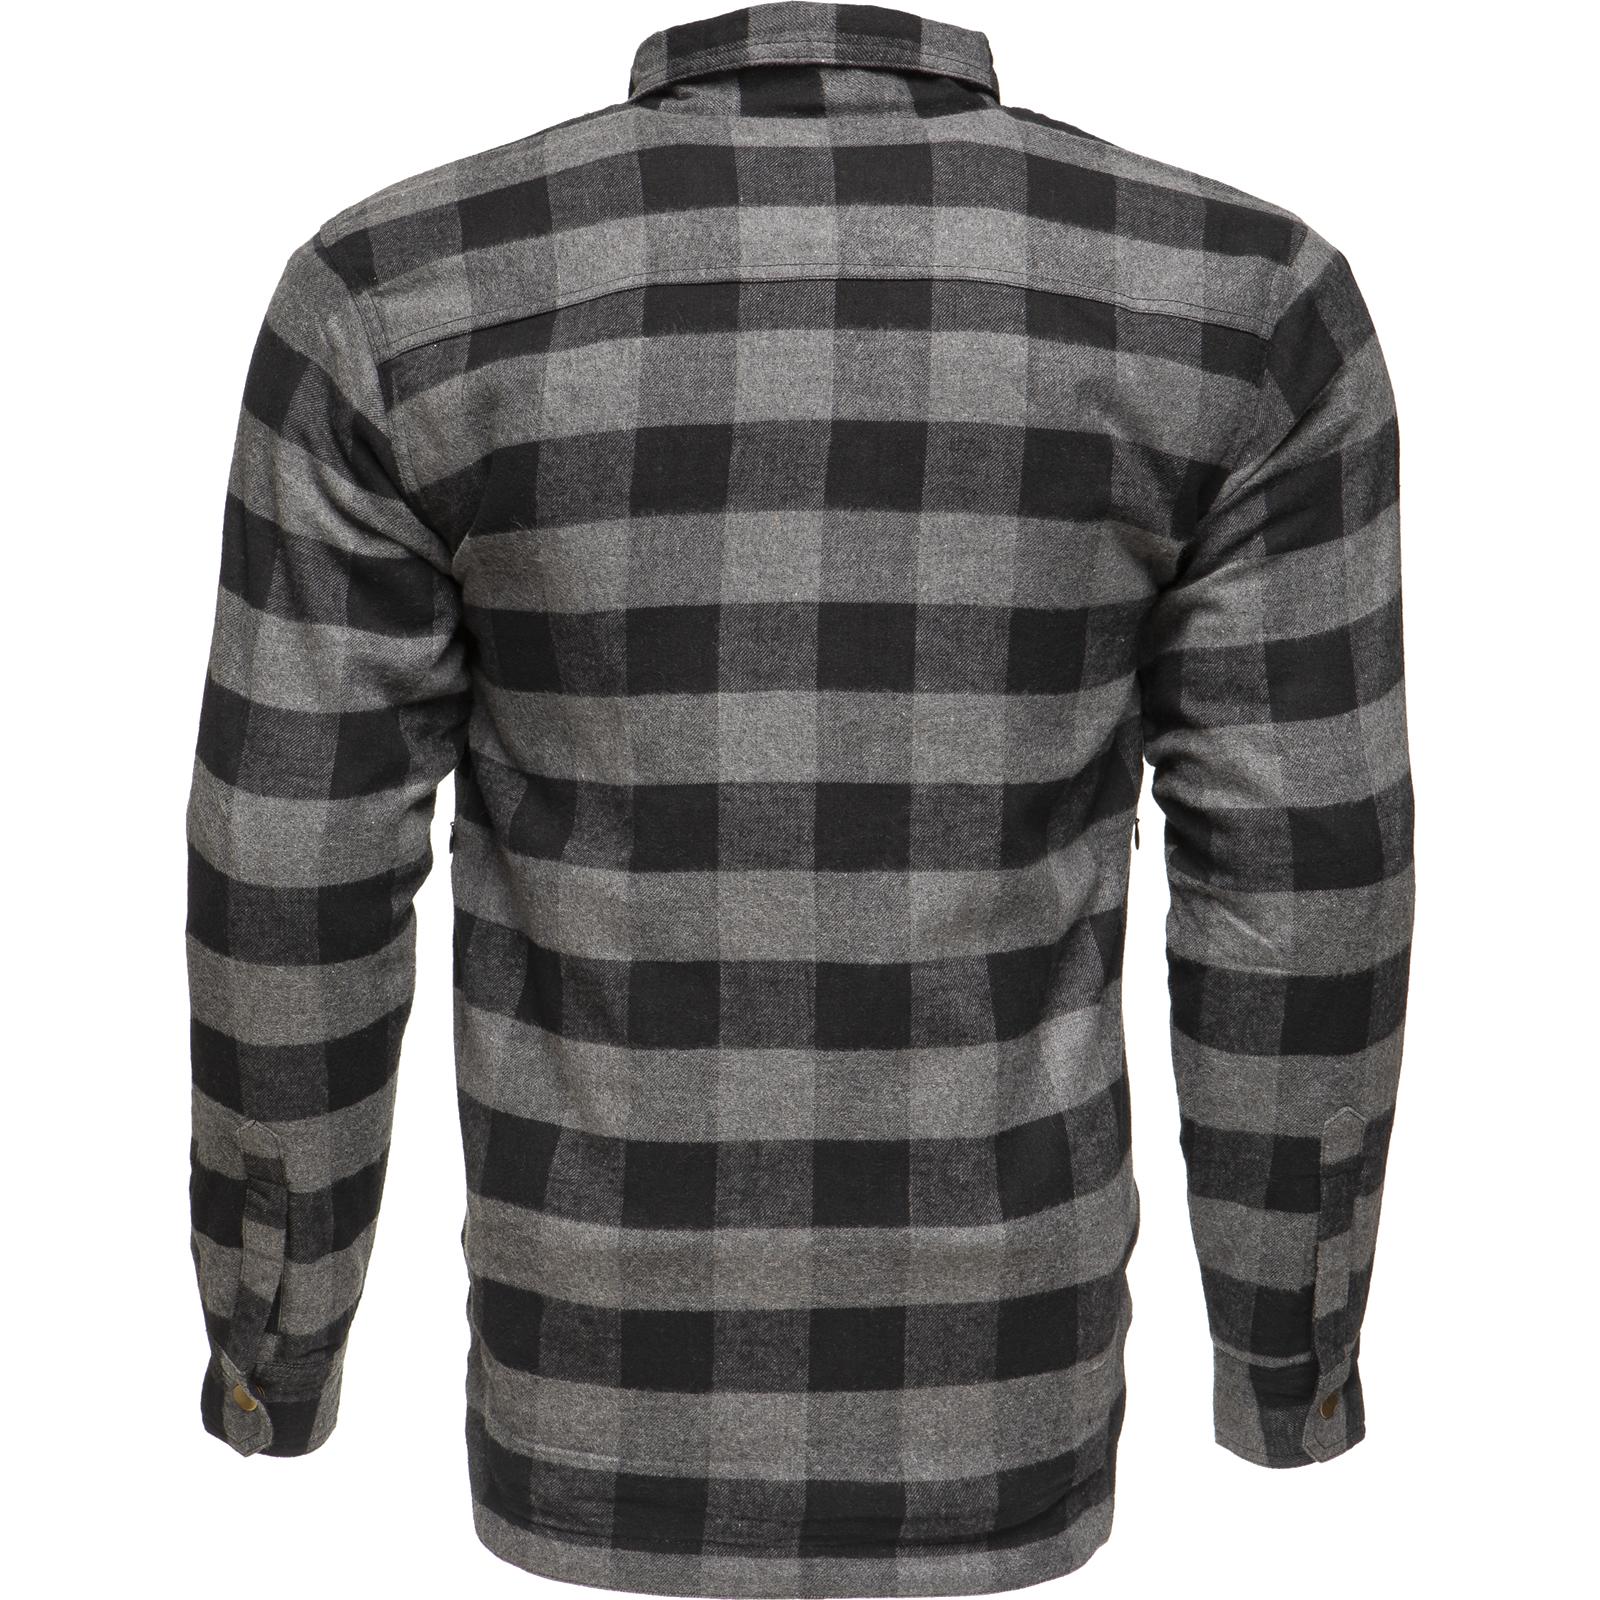 Black Coyote Kevlar Lined Motorcycle Shirt